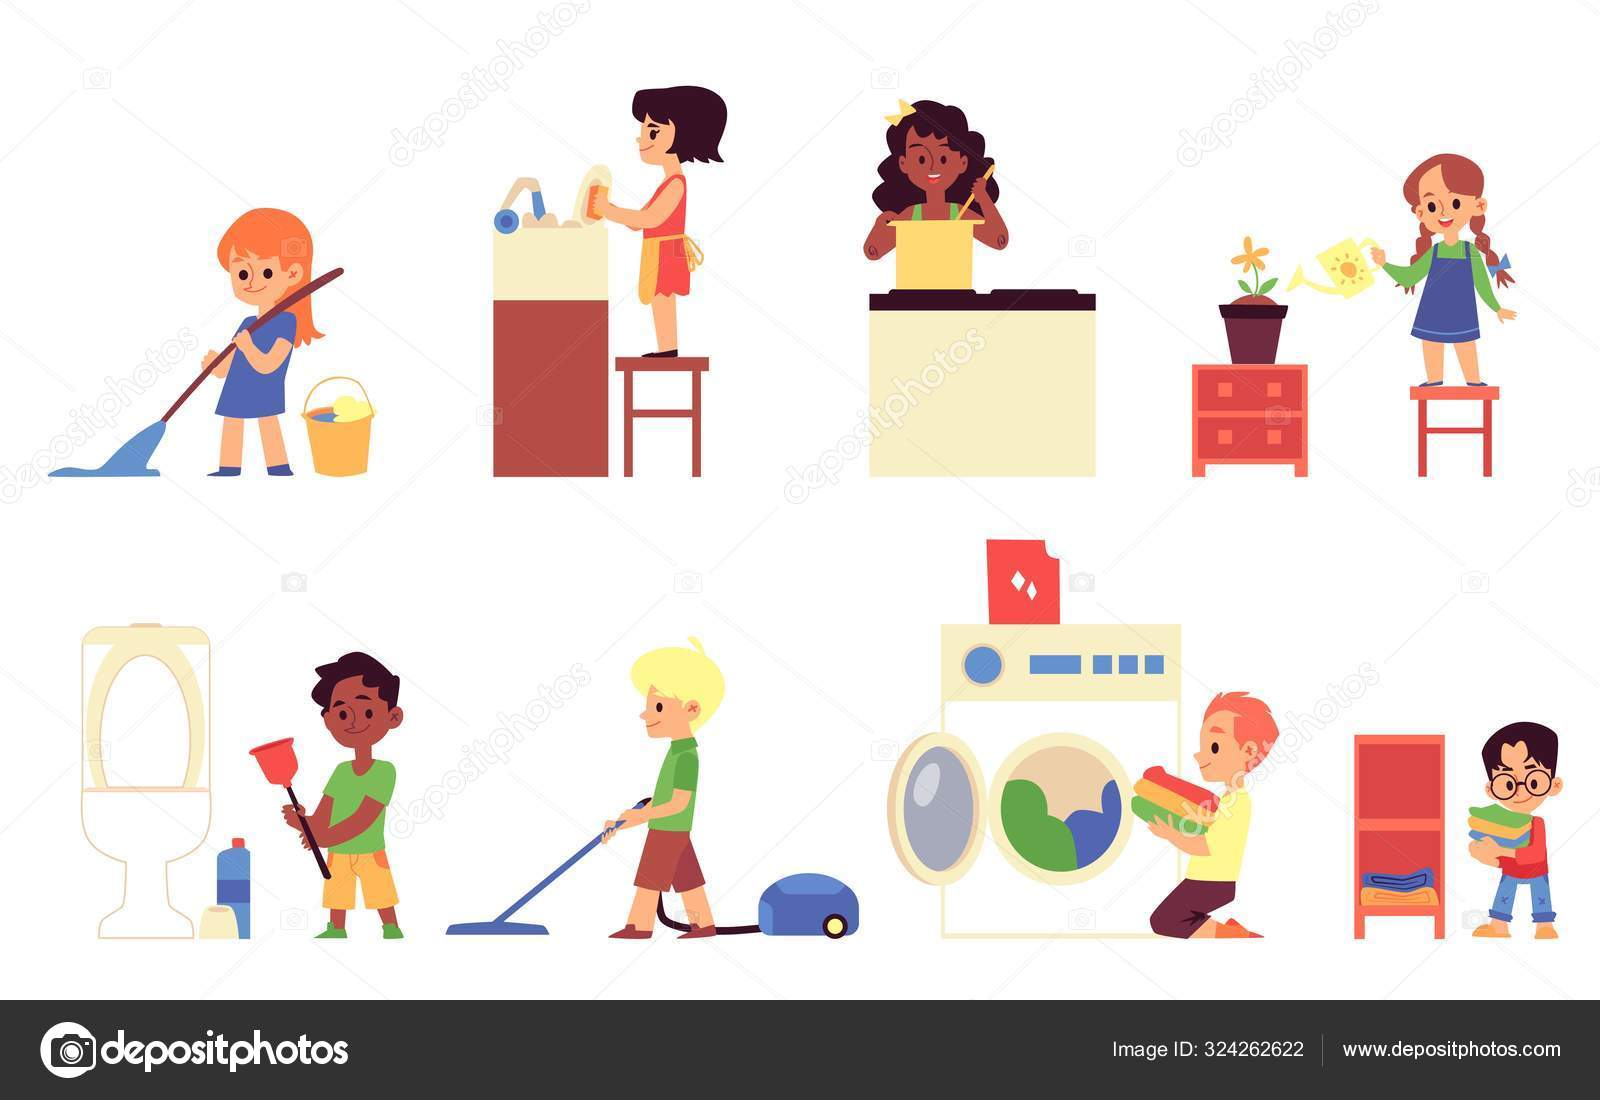 yo limpio mi casa | Clip art, Clip art library, Kids clipart